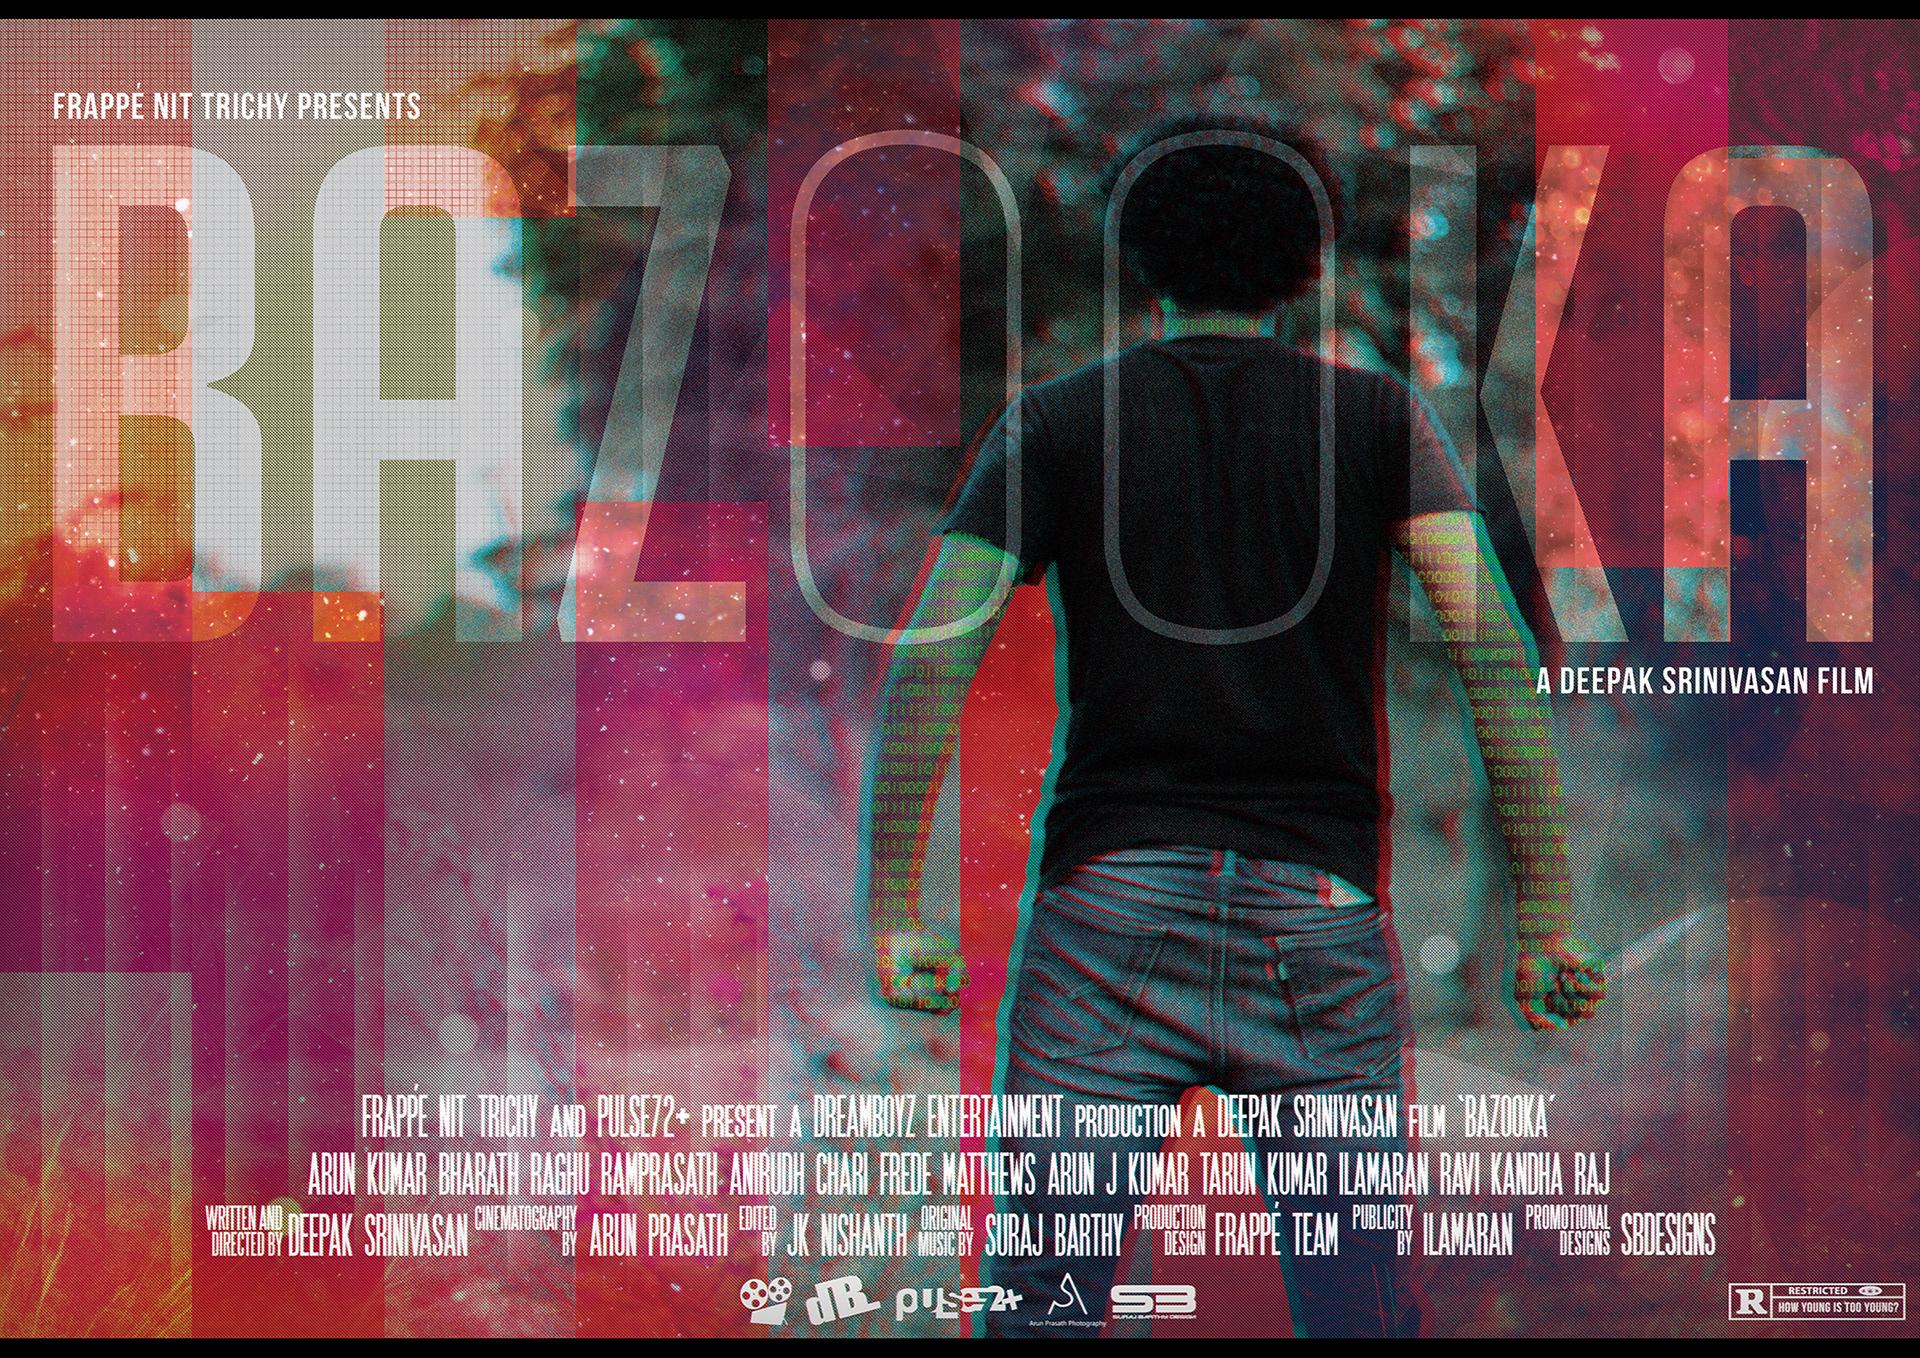 suraj barthy bazooka the short film